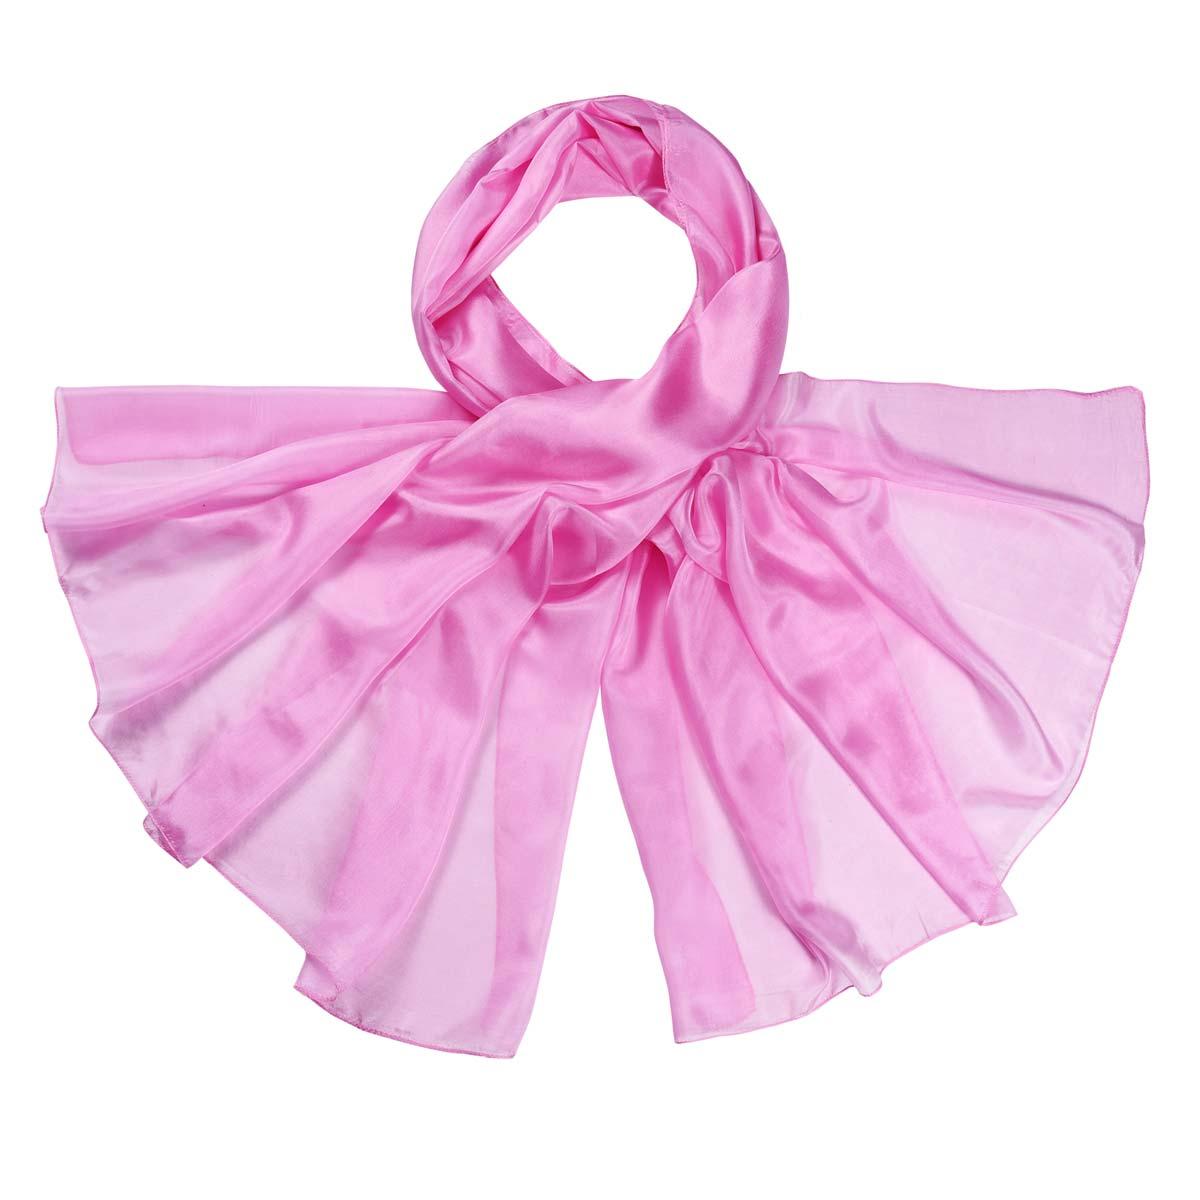 _Etole-soie-femme-rose